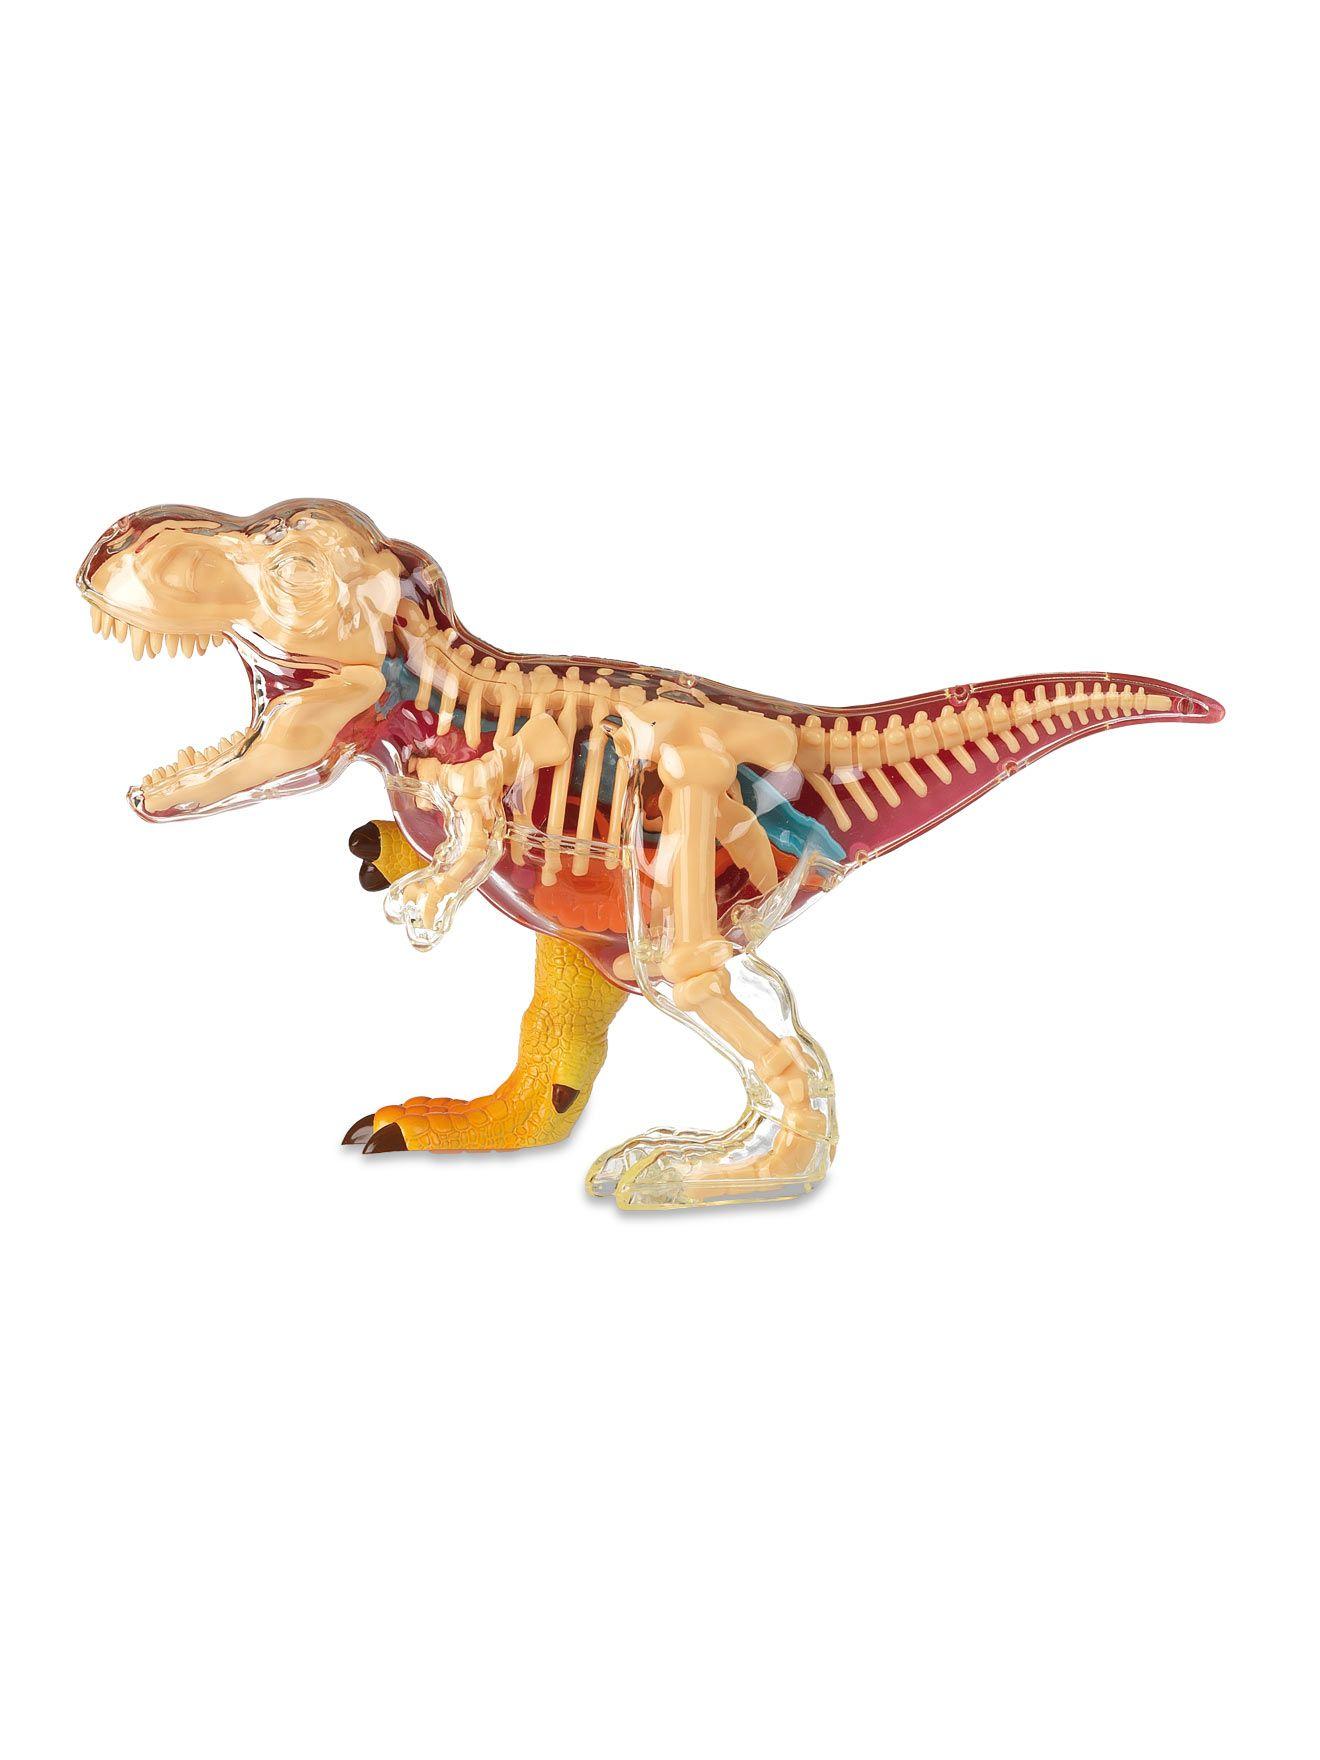 T-REX Anatomy   Petites Choses   Pinterest   Anatomy